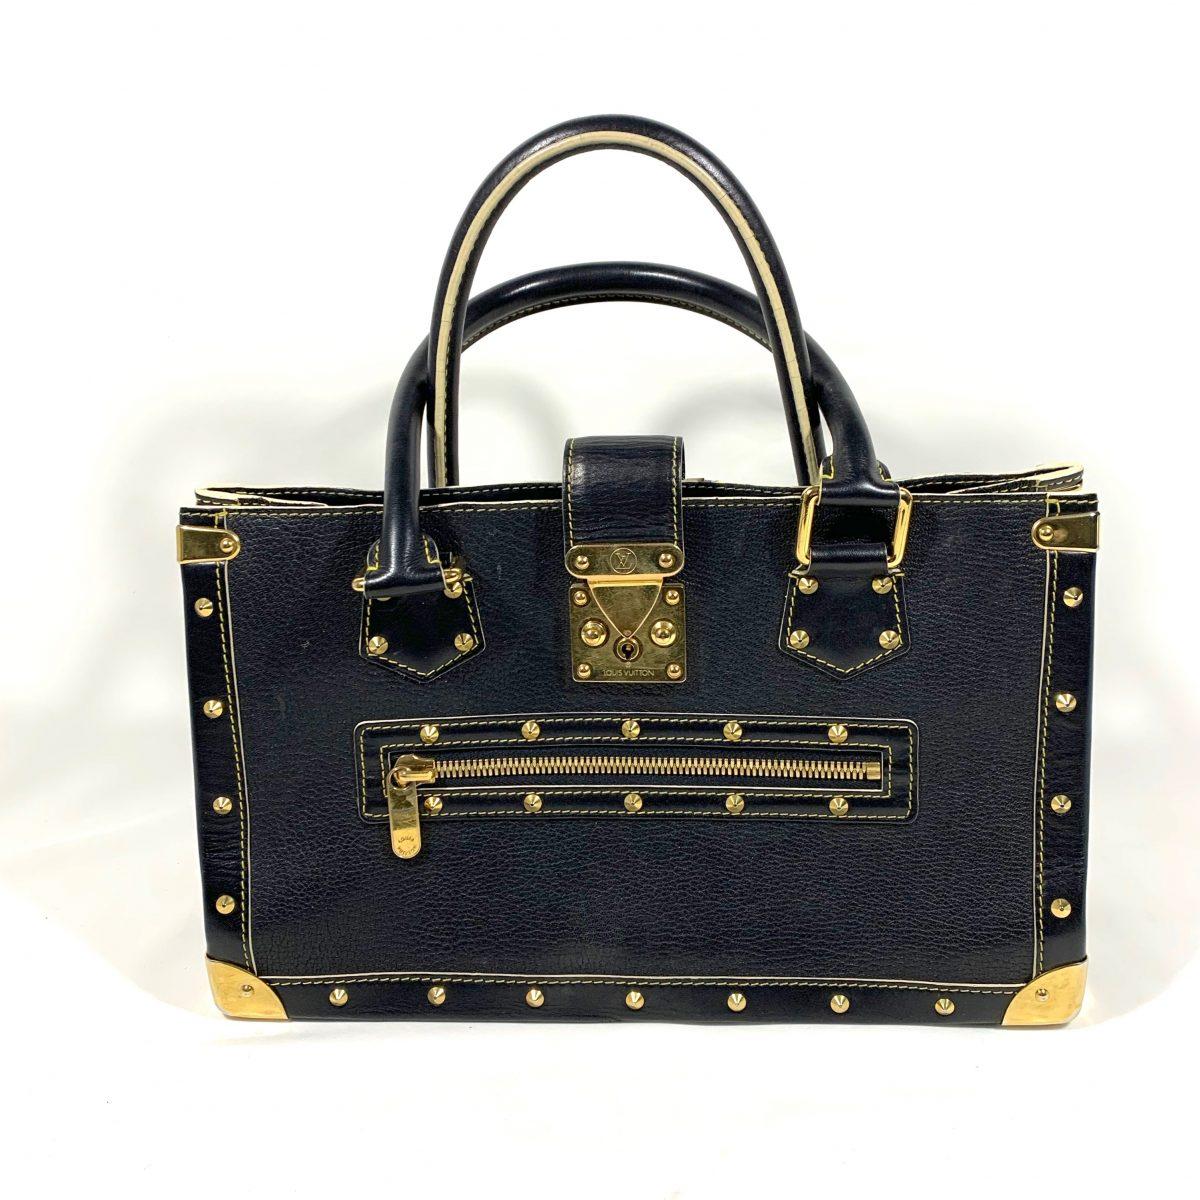 Louis Vuitton designer handbag